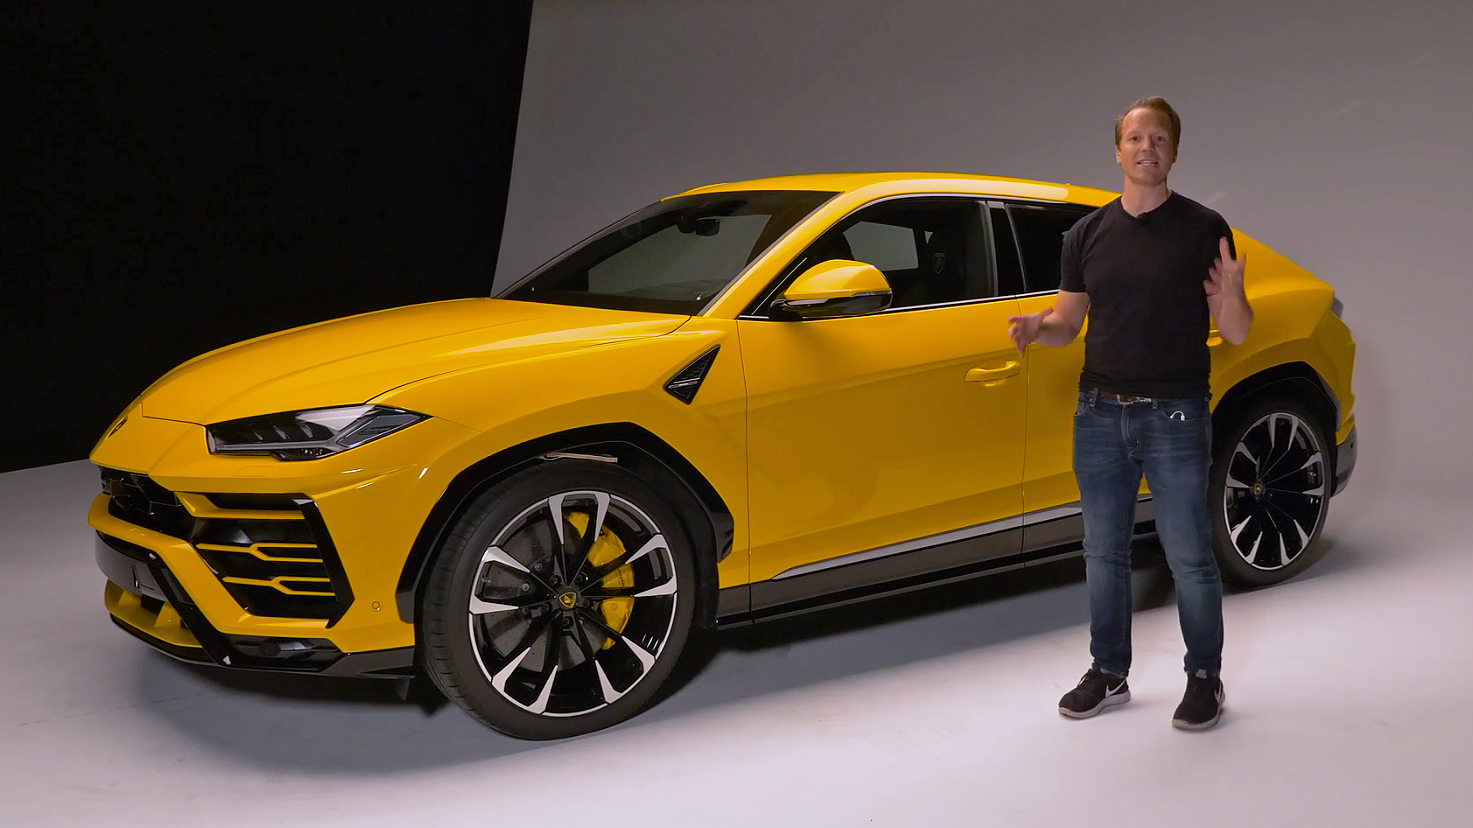 The Lamborghini Urus shoe is here | Top Gear